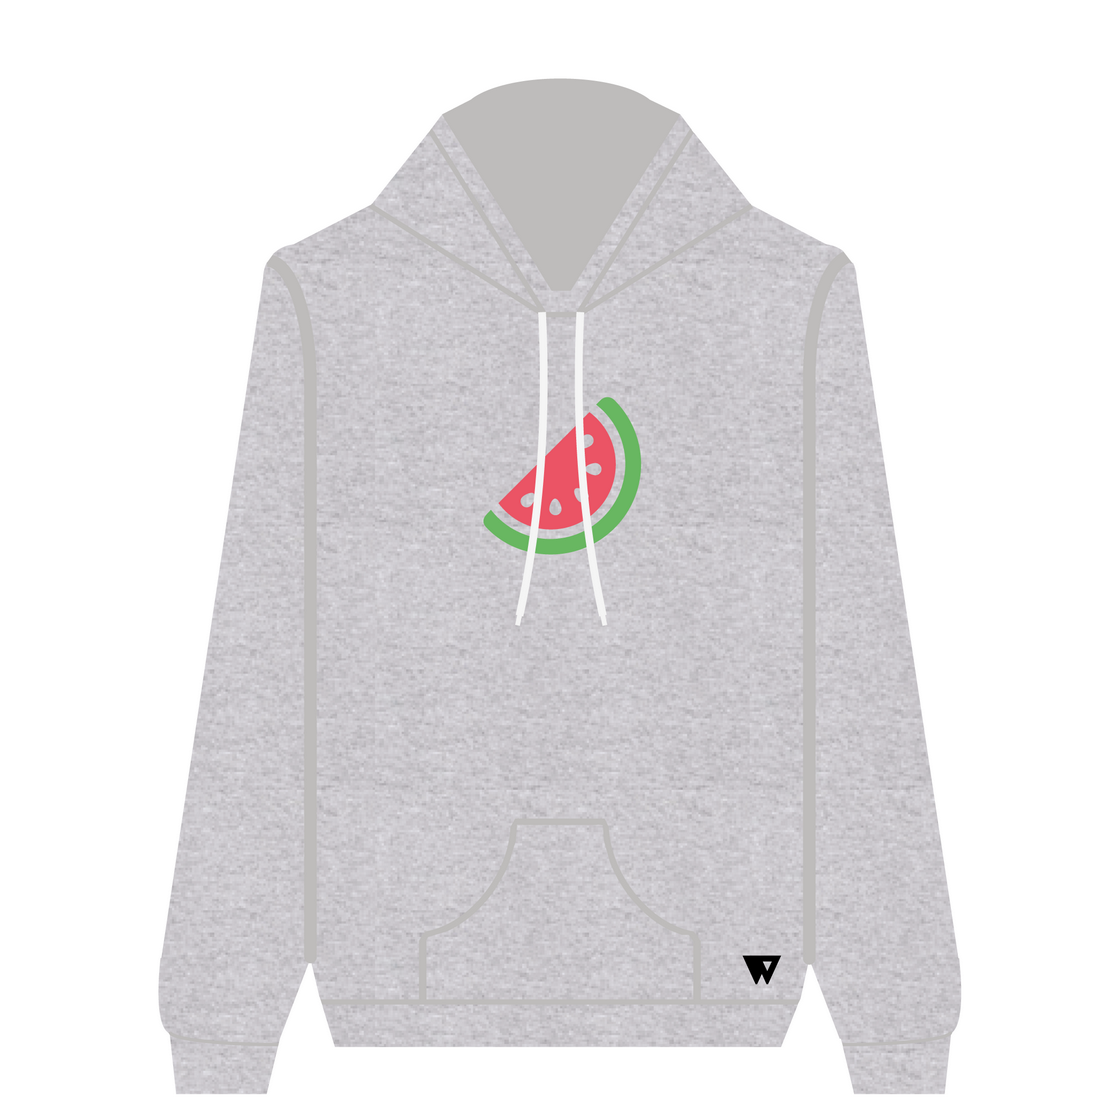 Hoodie Watermelon | Wuzzee